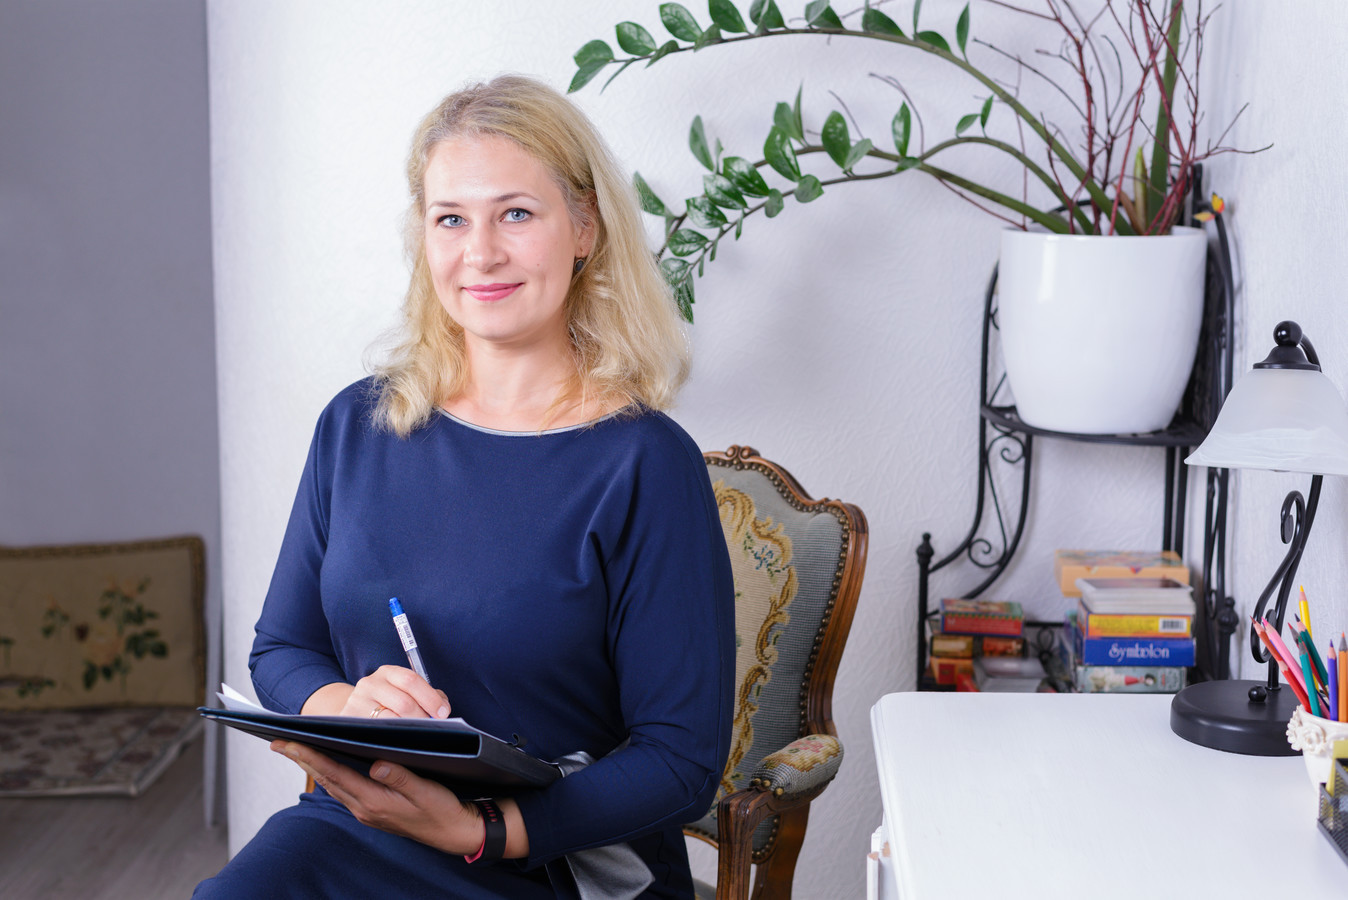 Individualioji psichoterapija Geštalto metodu.